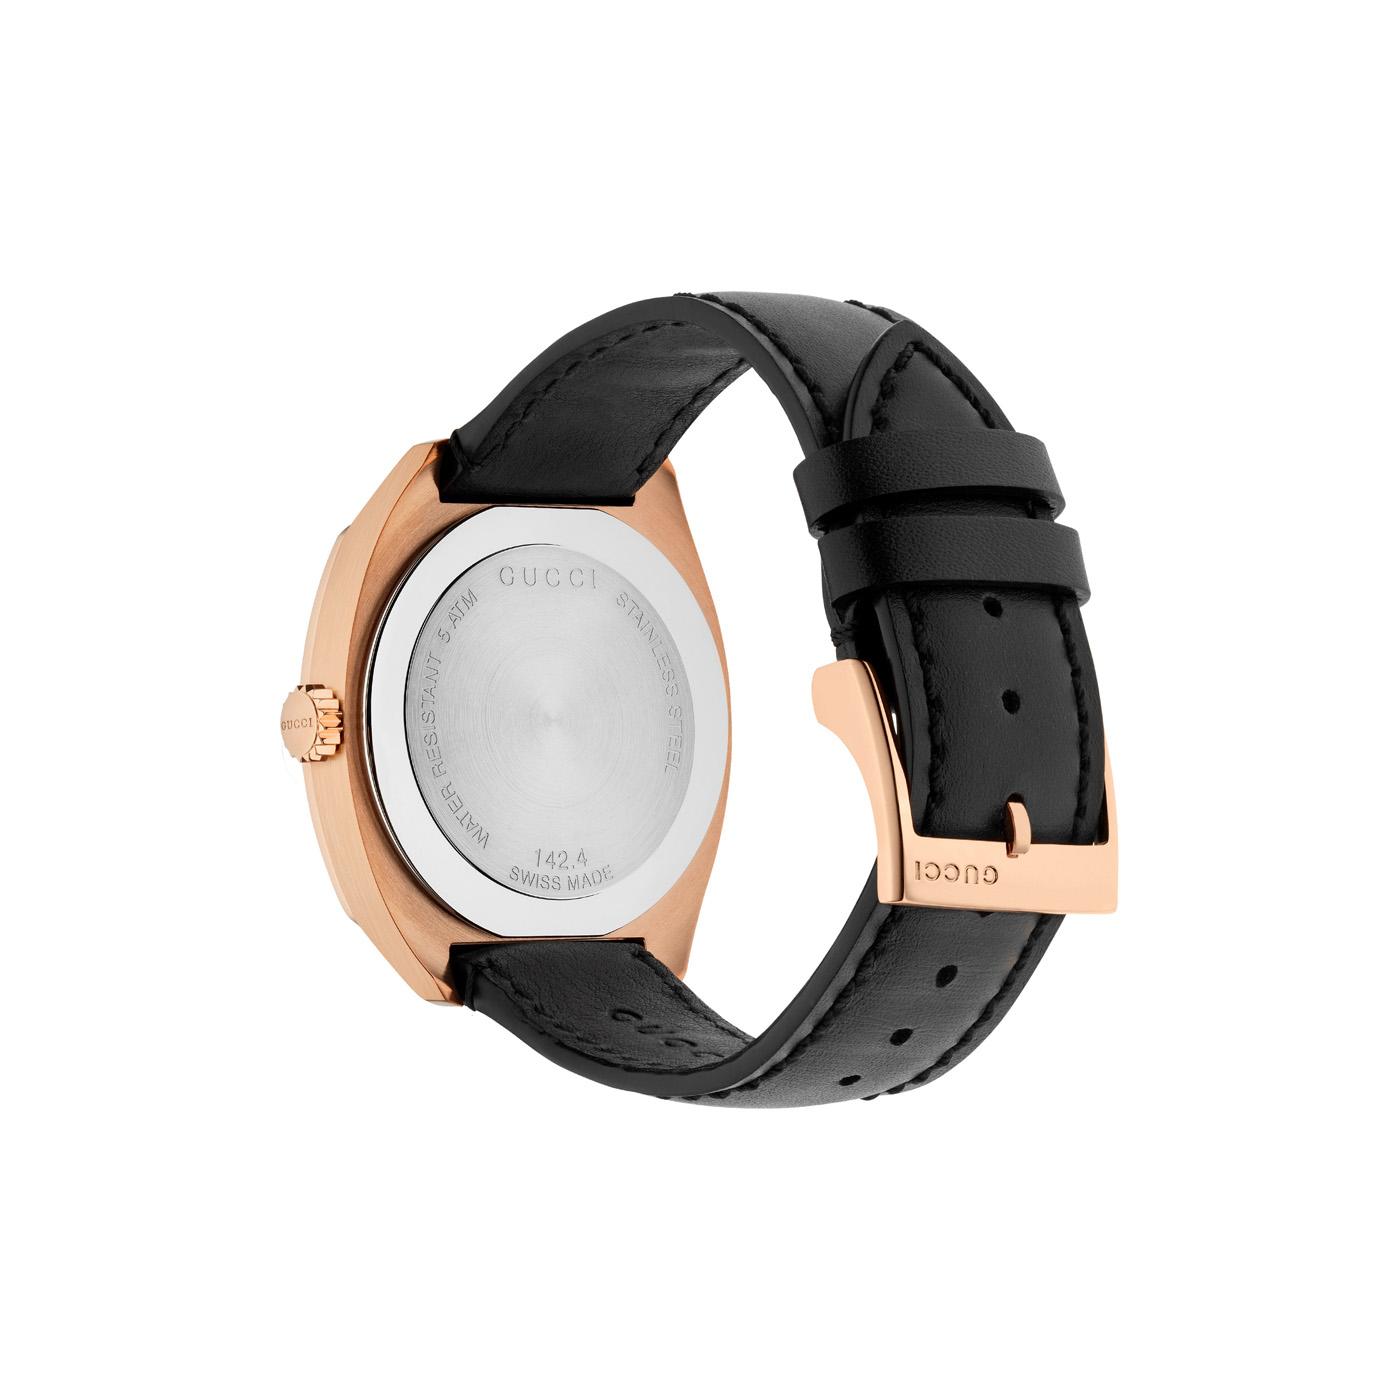 06eeab02d00c Reloj Gucci Mujer Oro